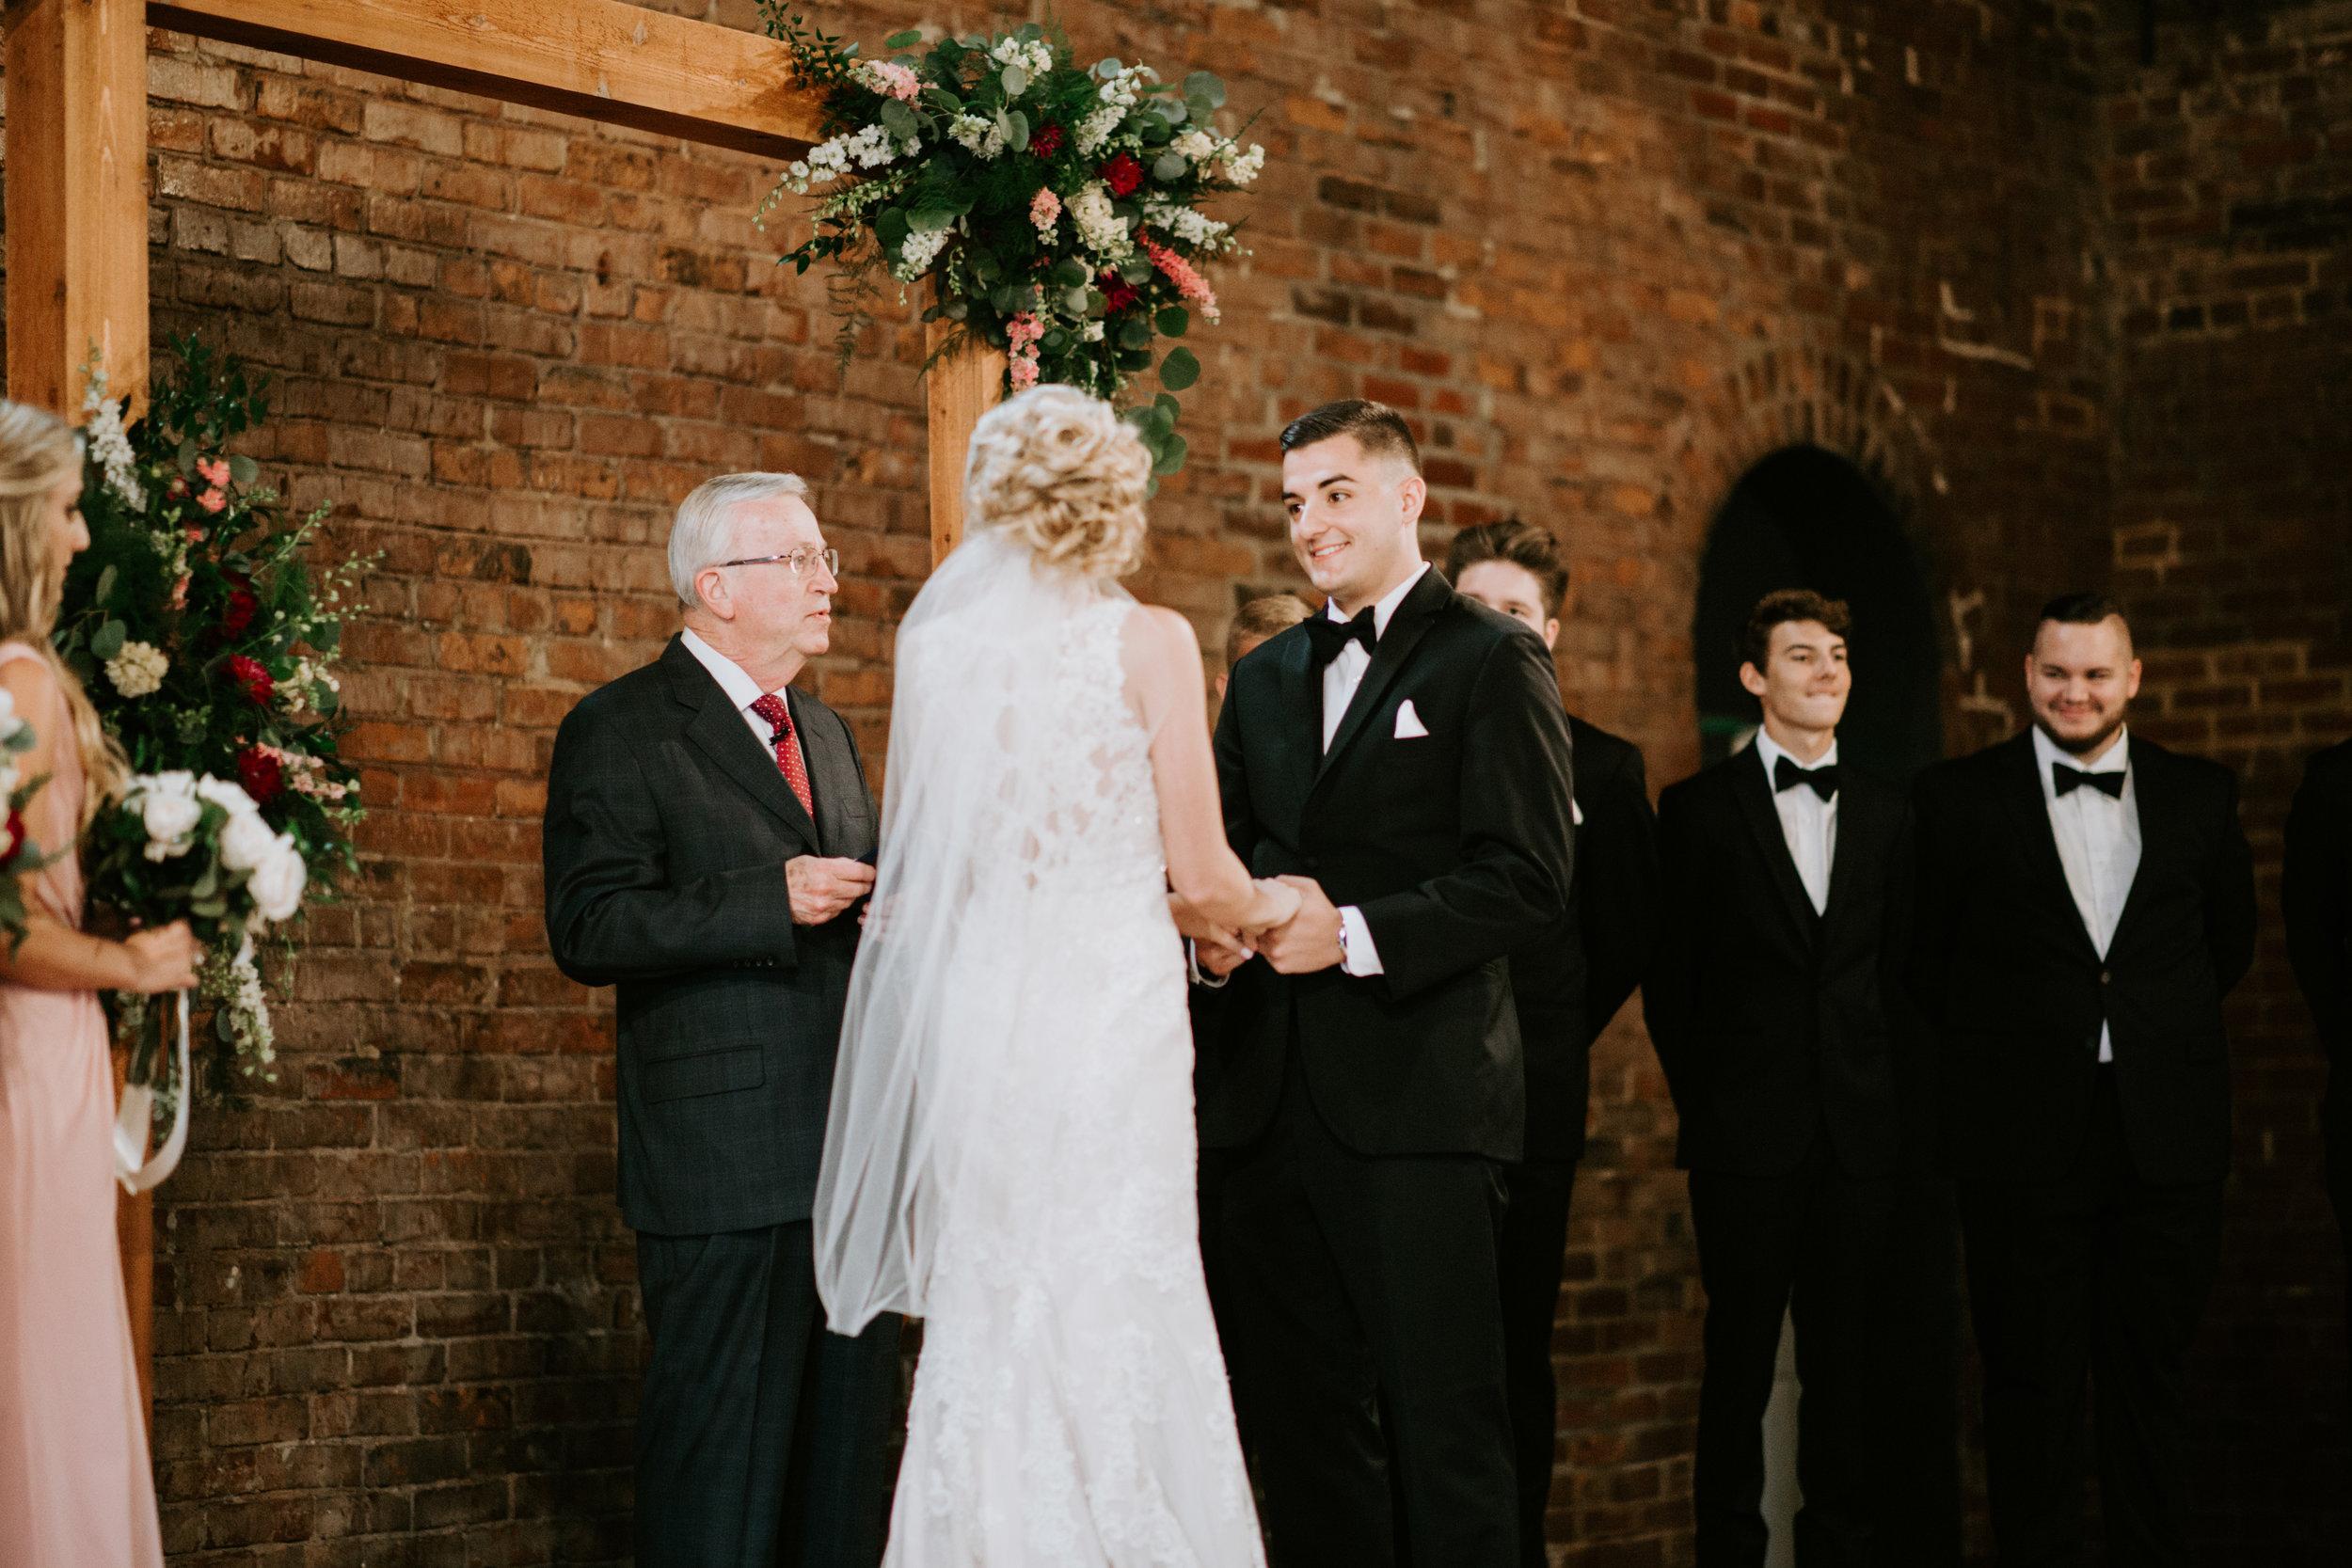 Kayley + Robert + Chattanooga + Nashville + Tennessee + Wedding + Photographer-8.jpg